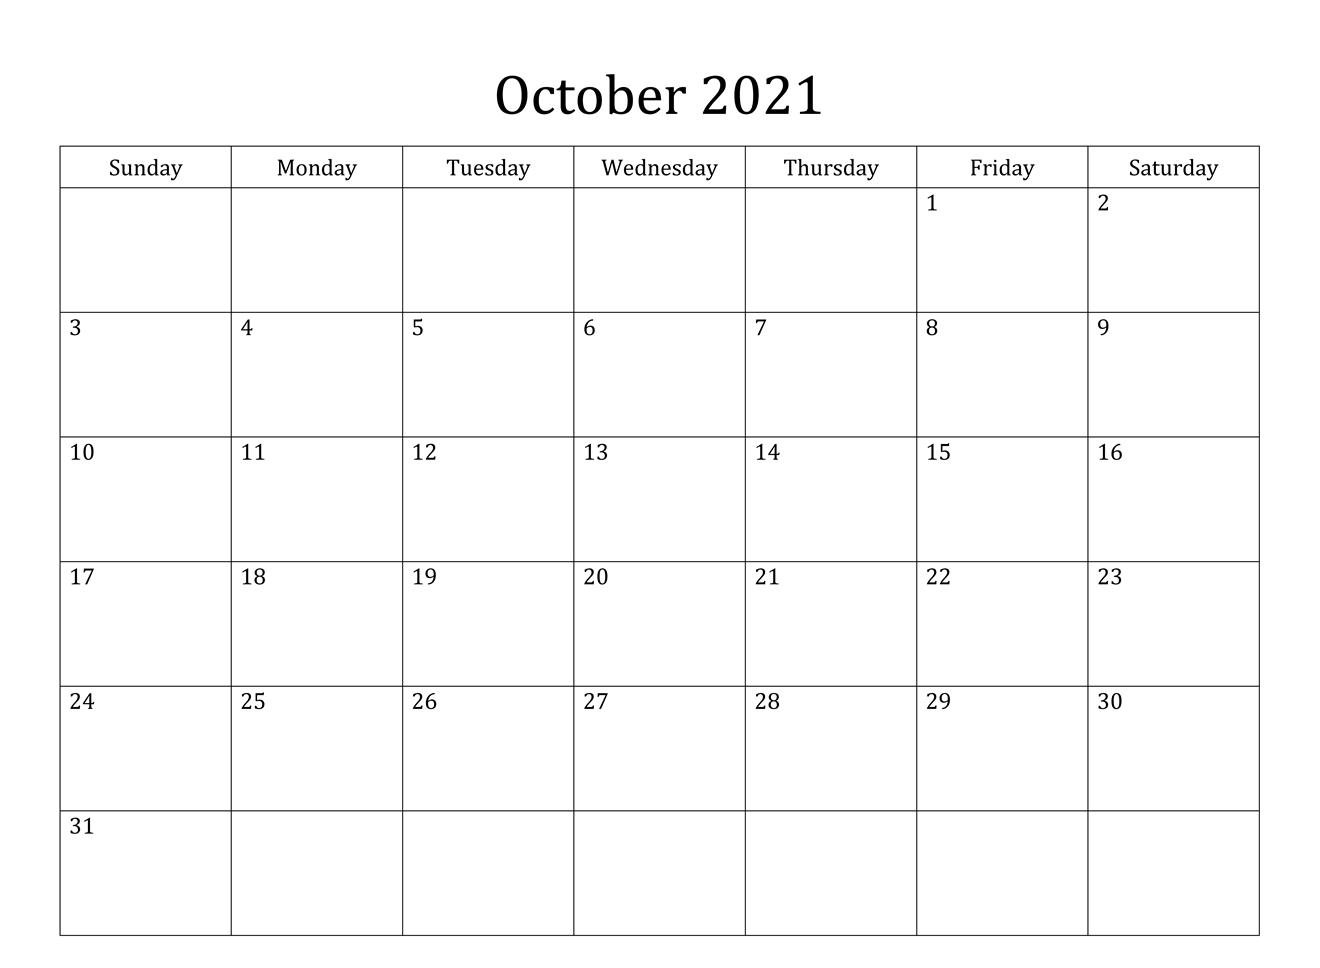 October 2021 Calendar PDF